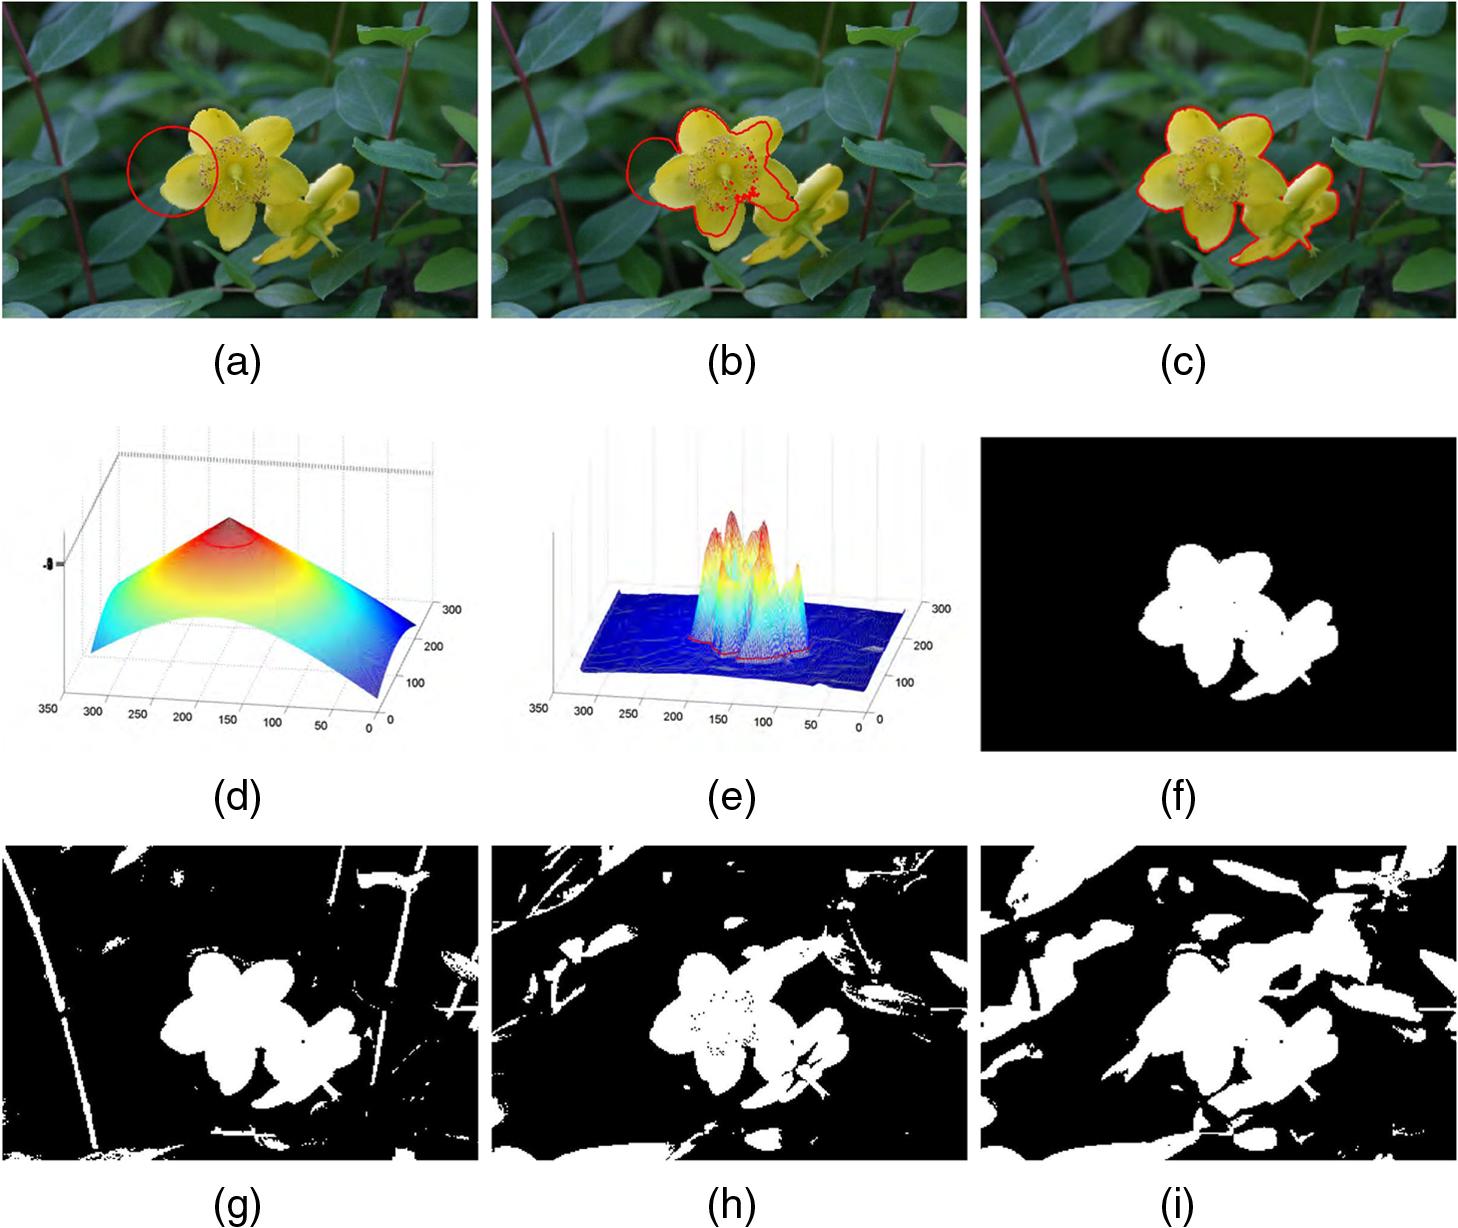 Texture image segmentation using statistical active contours